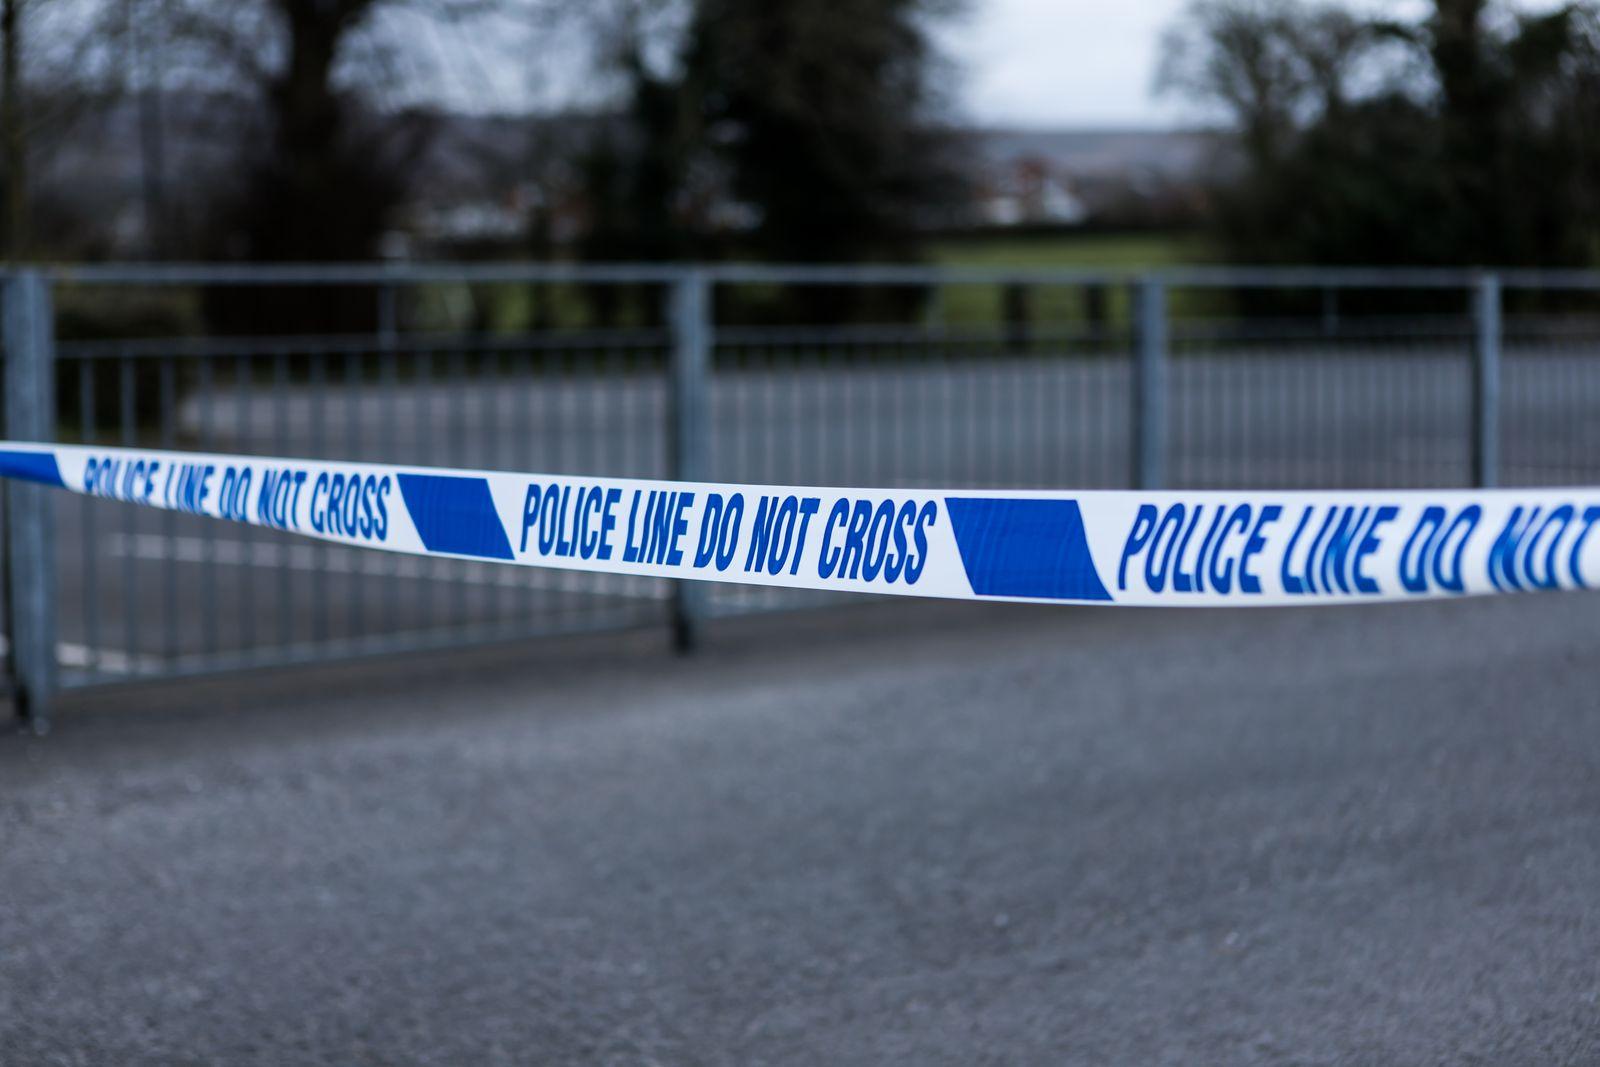 Police barrier tape in the UK